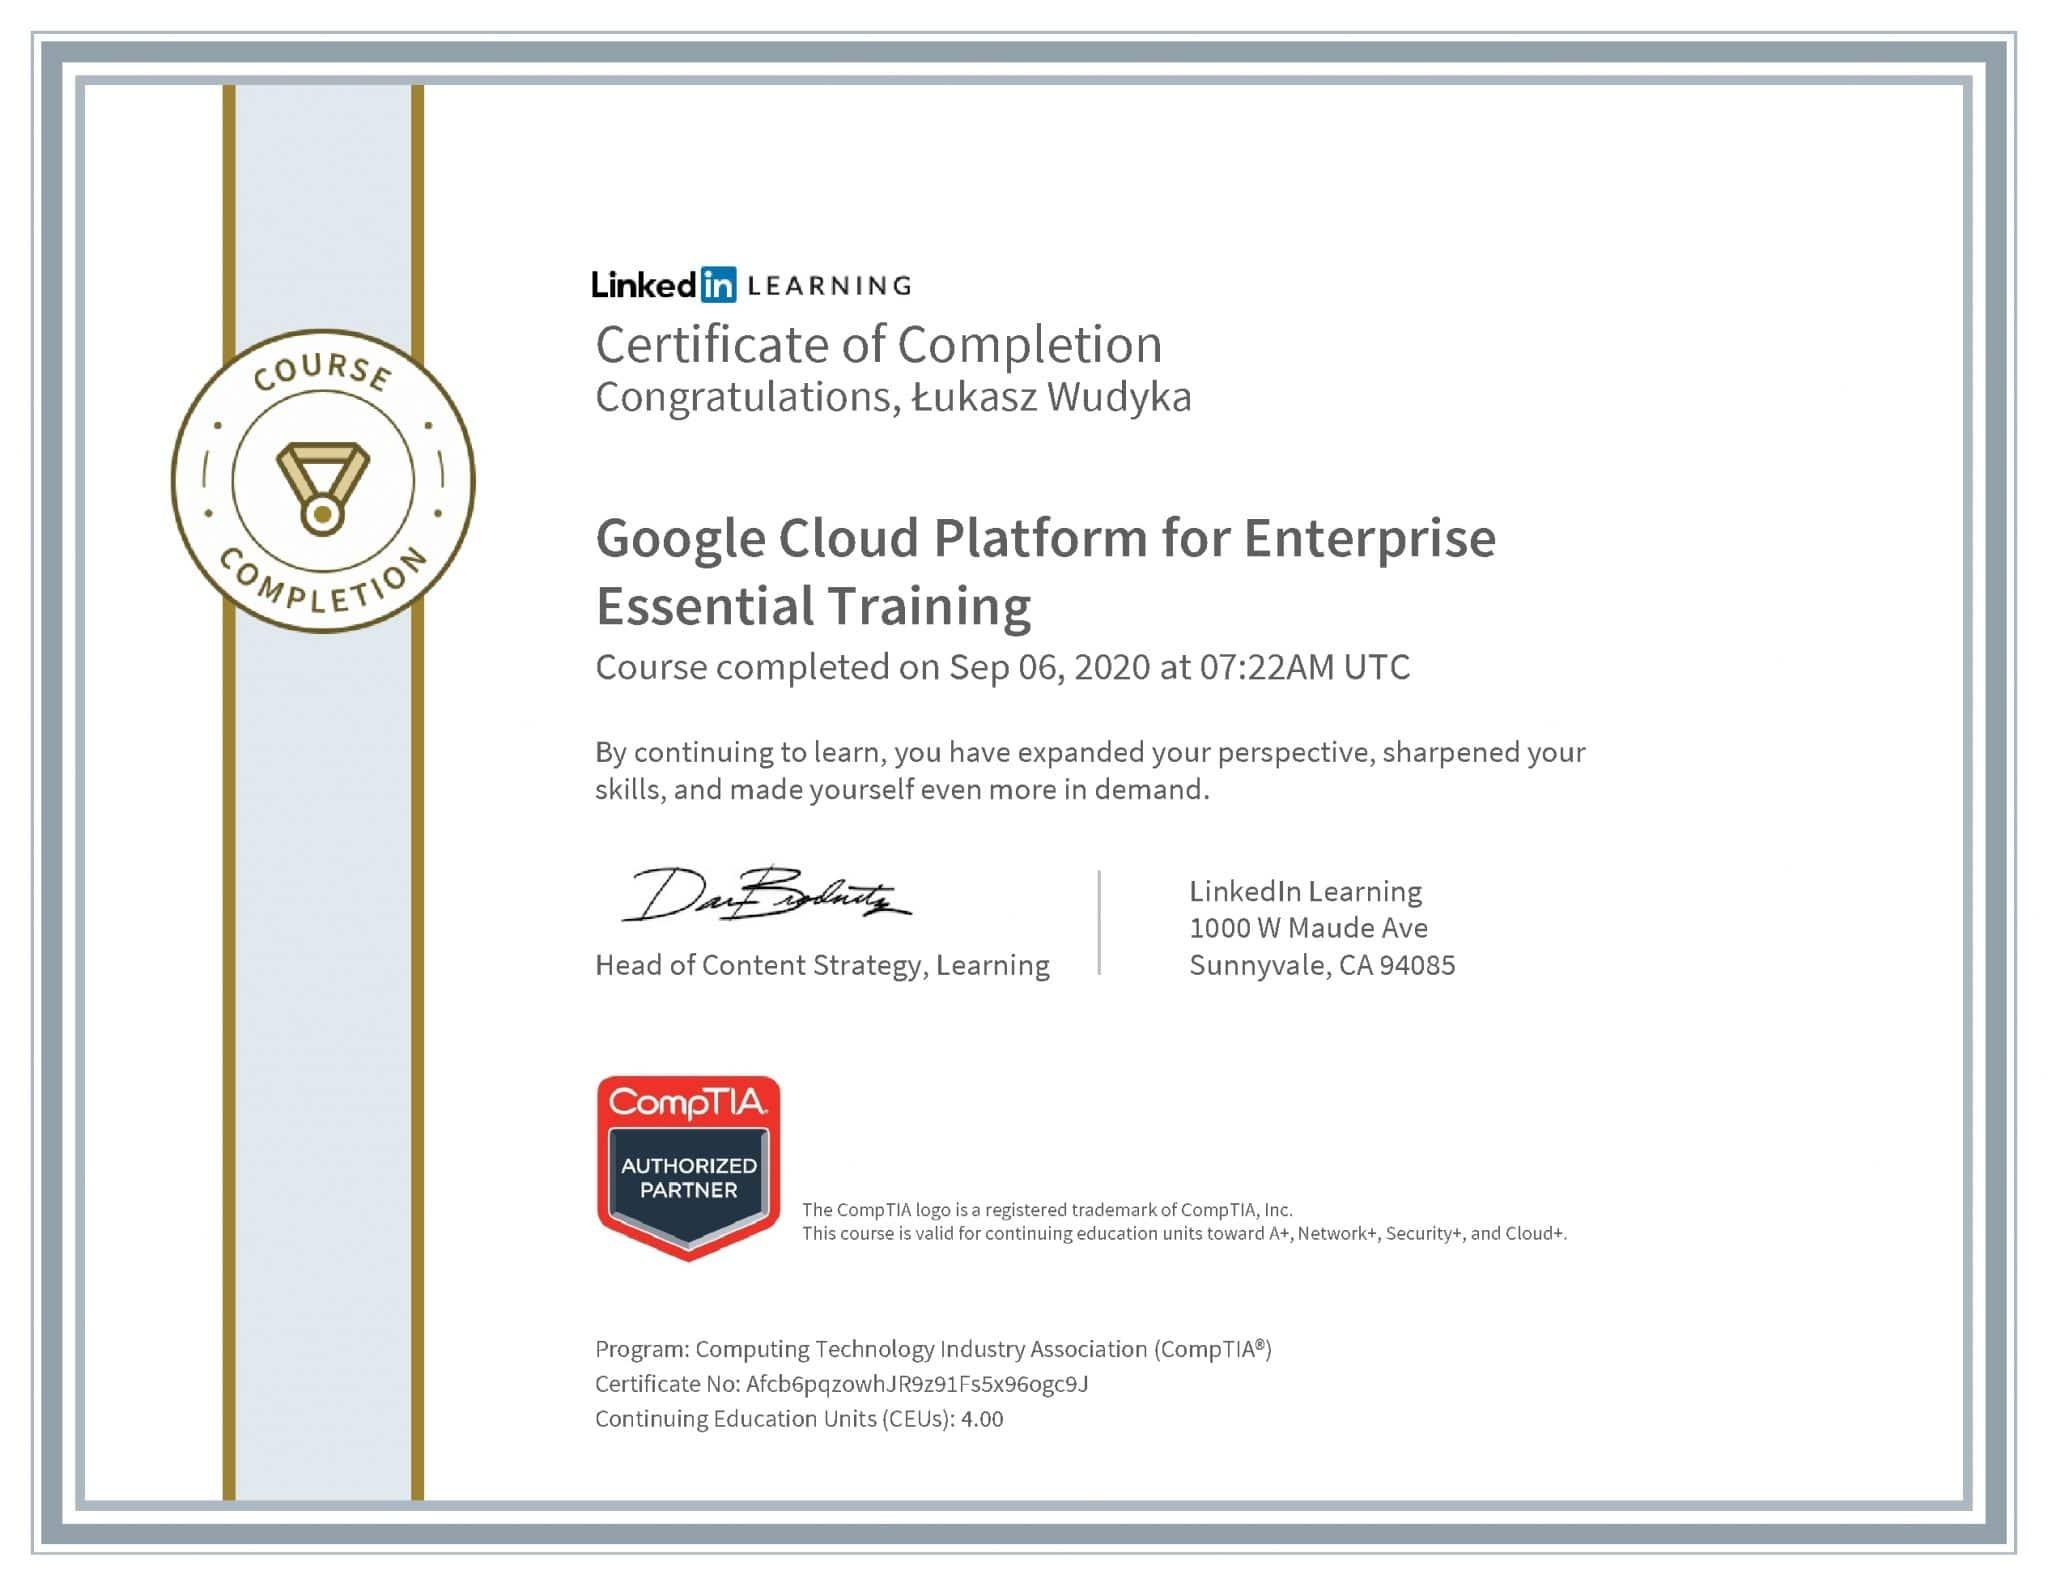 Łukasz Wudyka certyfikat LinkedIn Google Cloud Platform for Enterprise Essential Training CompTIA